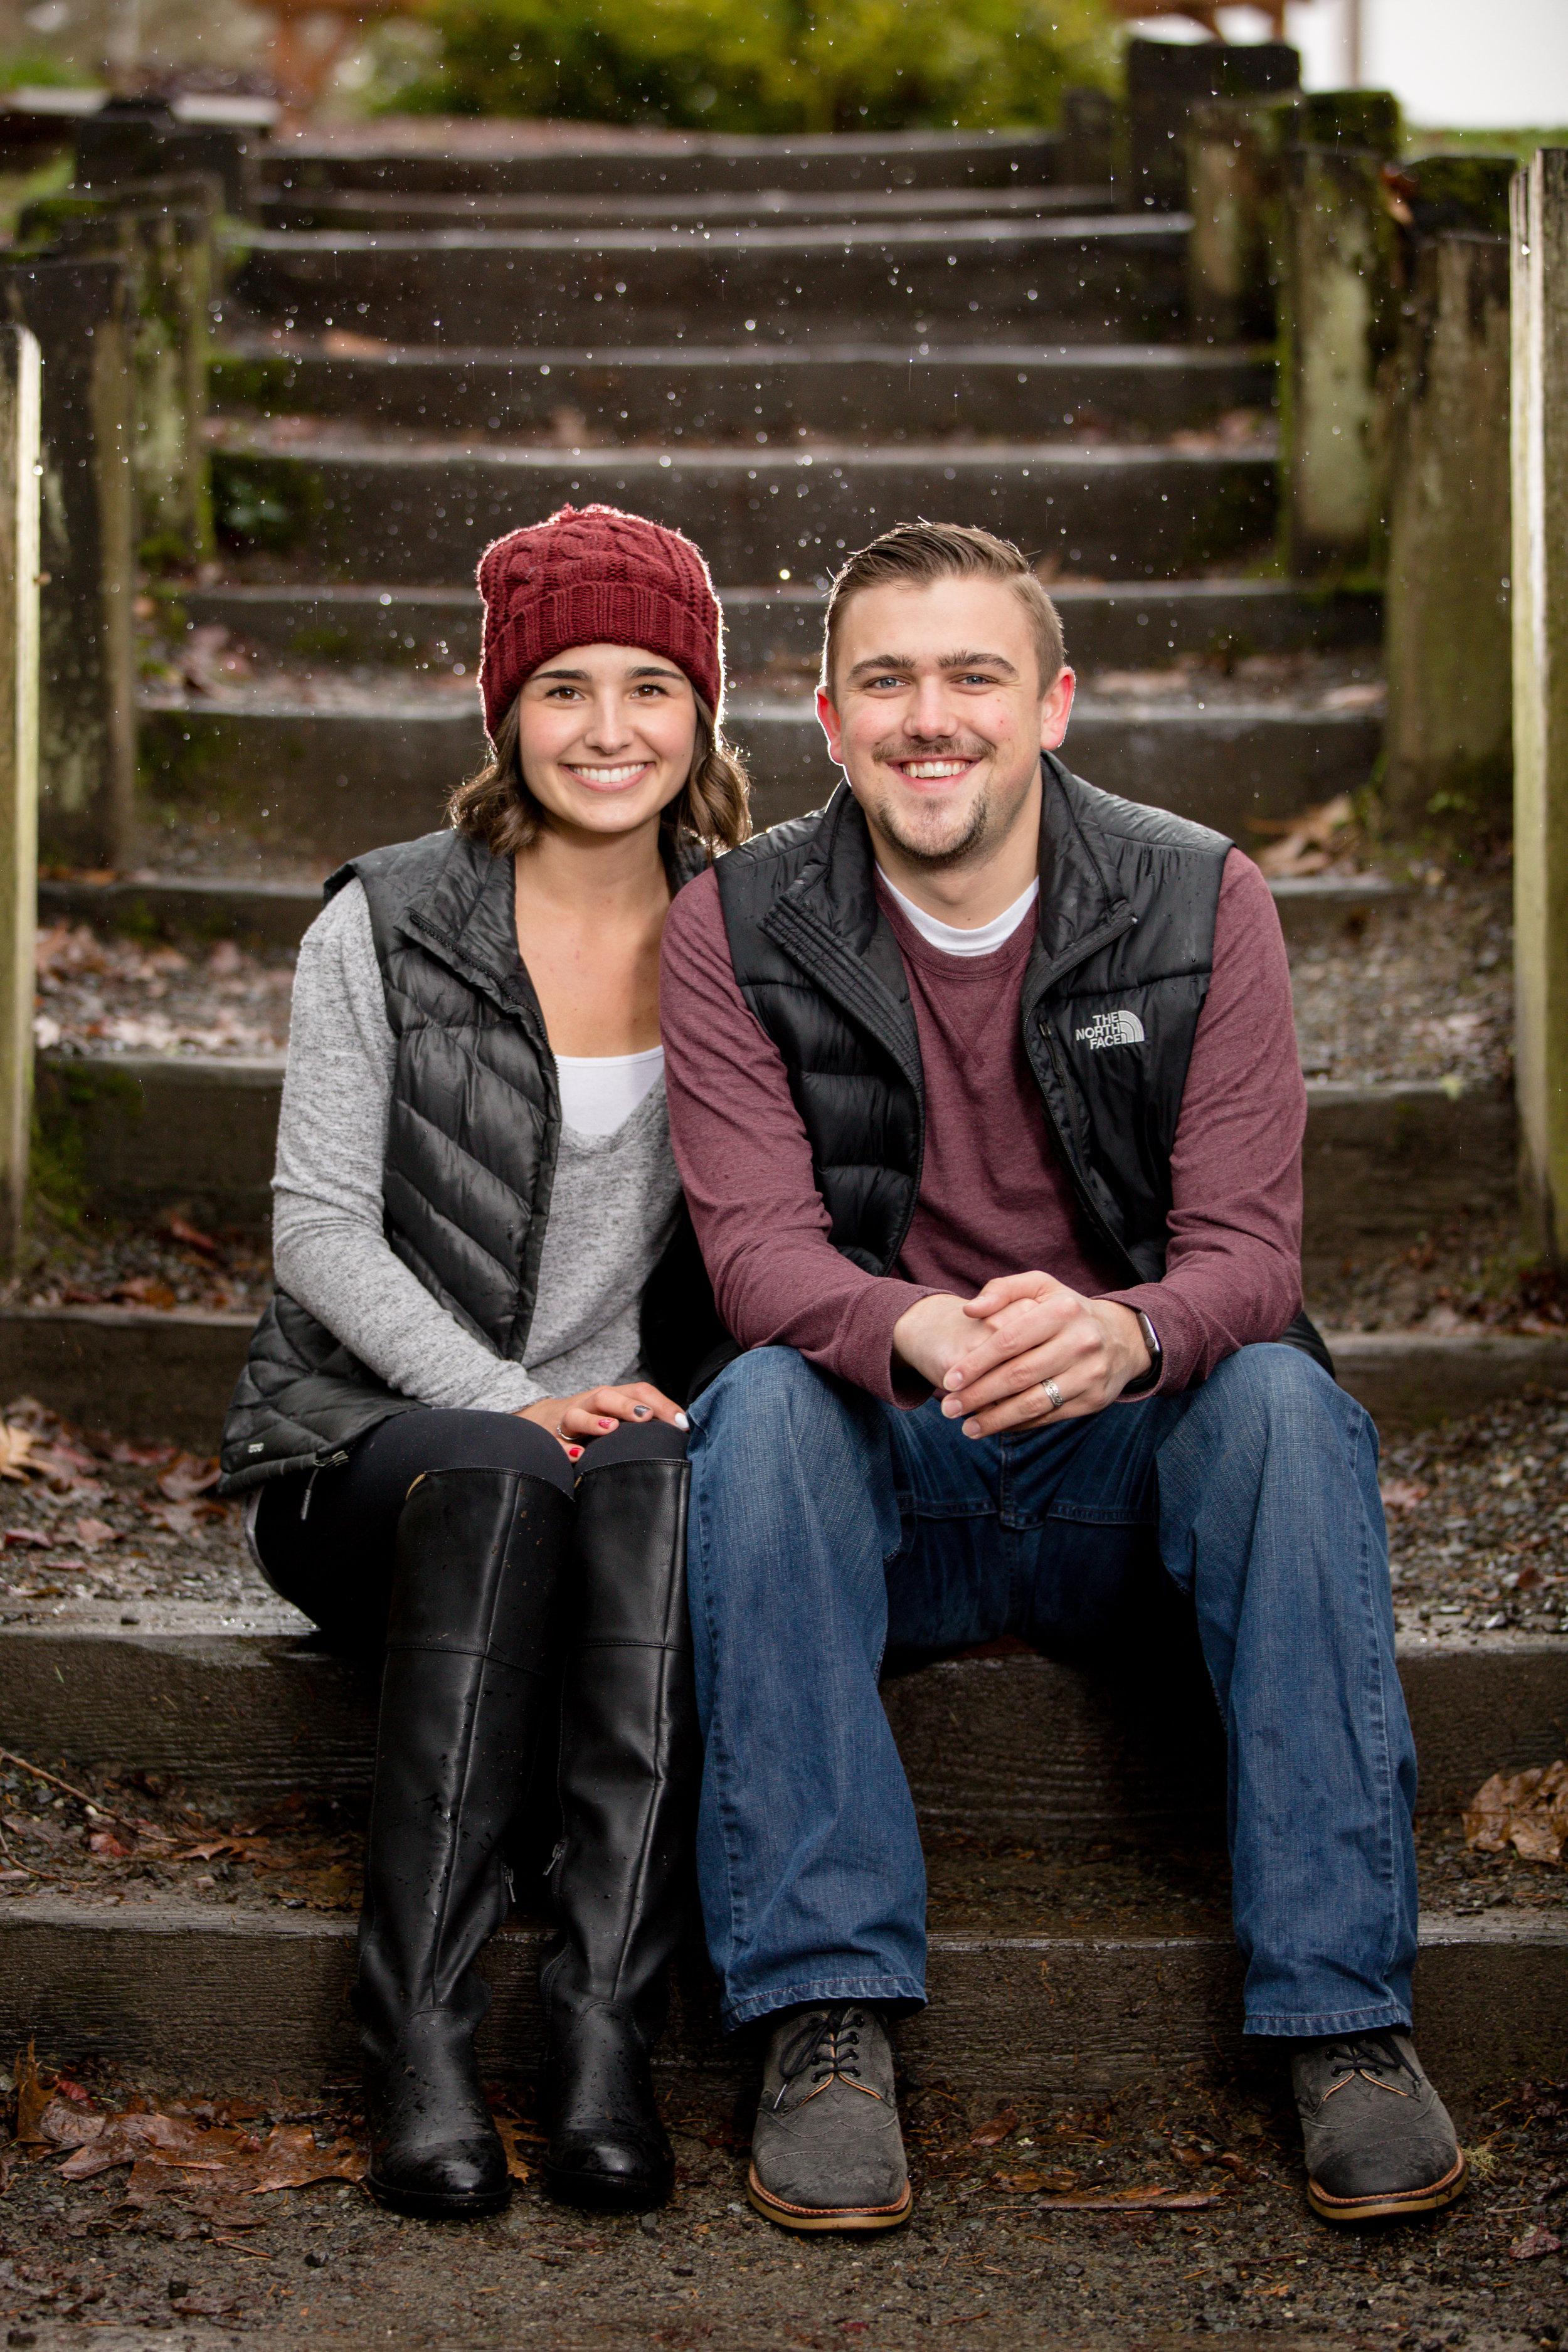 Engagement Photography | Snohomish County Photographer | Lake Stevens, WA